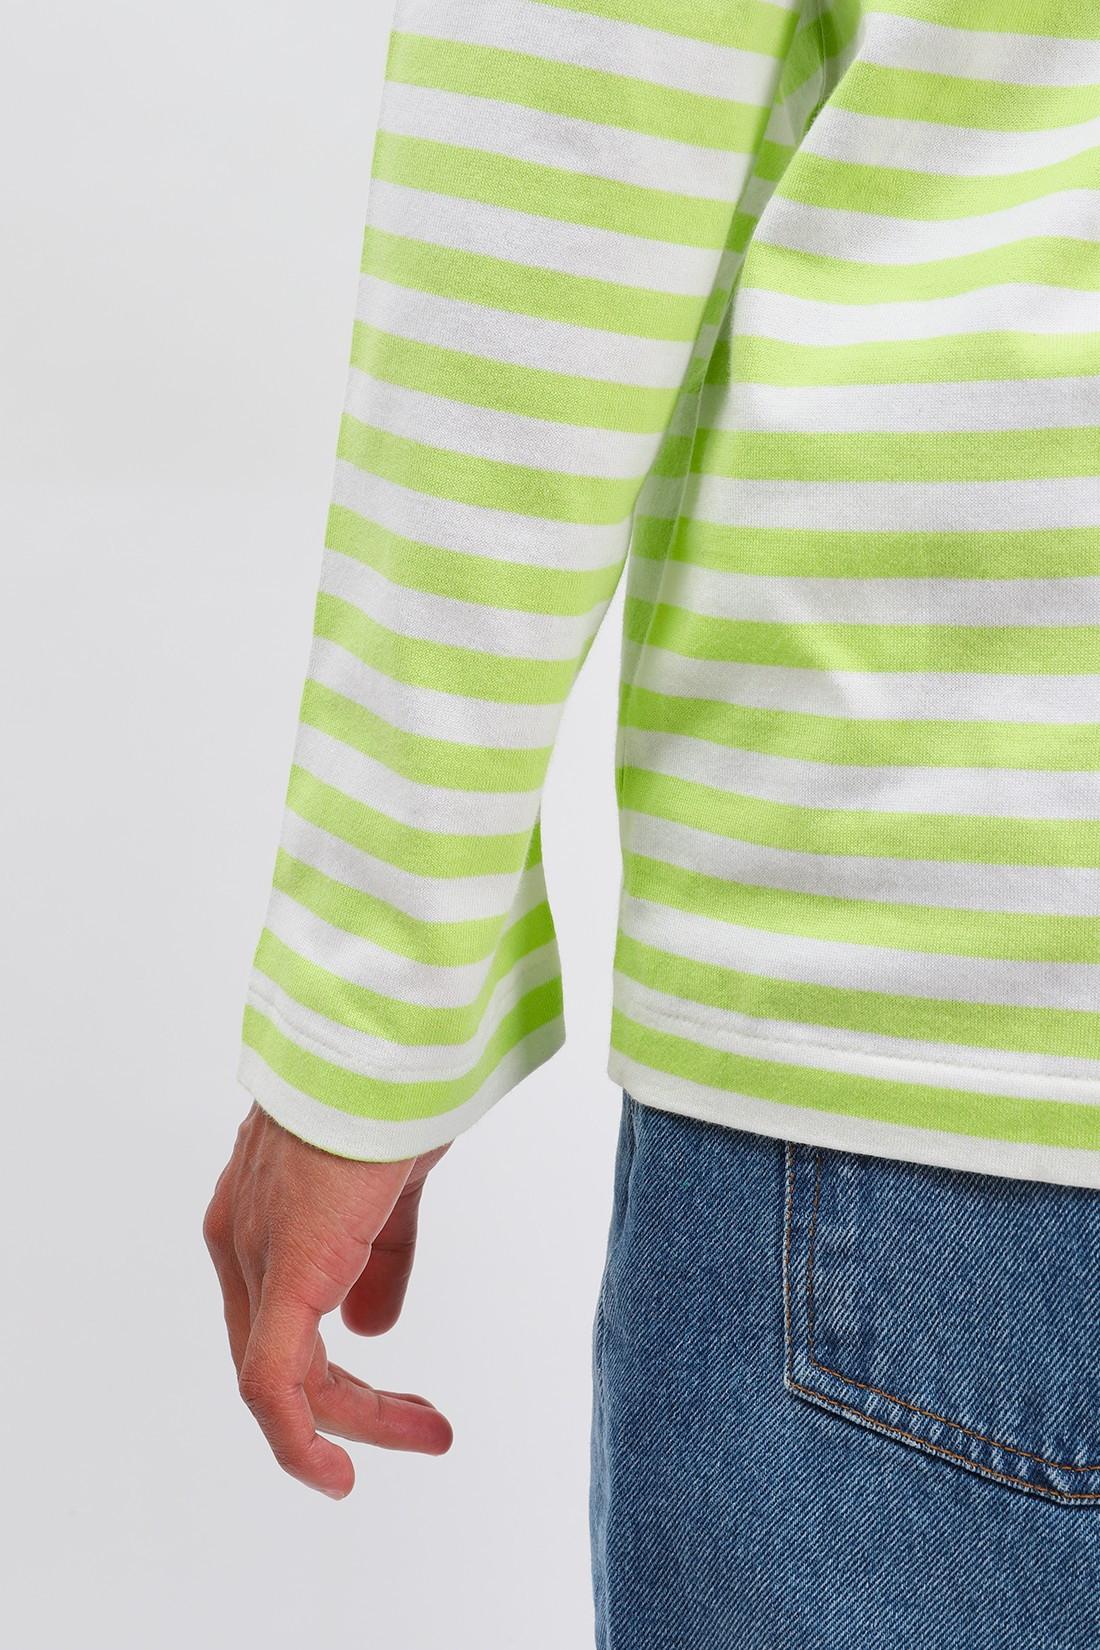 COMME DES GARÇONS PLAY / Play striped t-shirt Green white